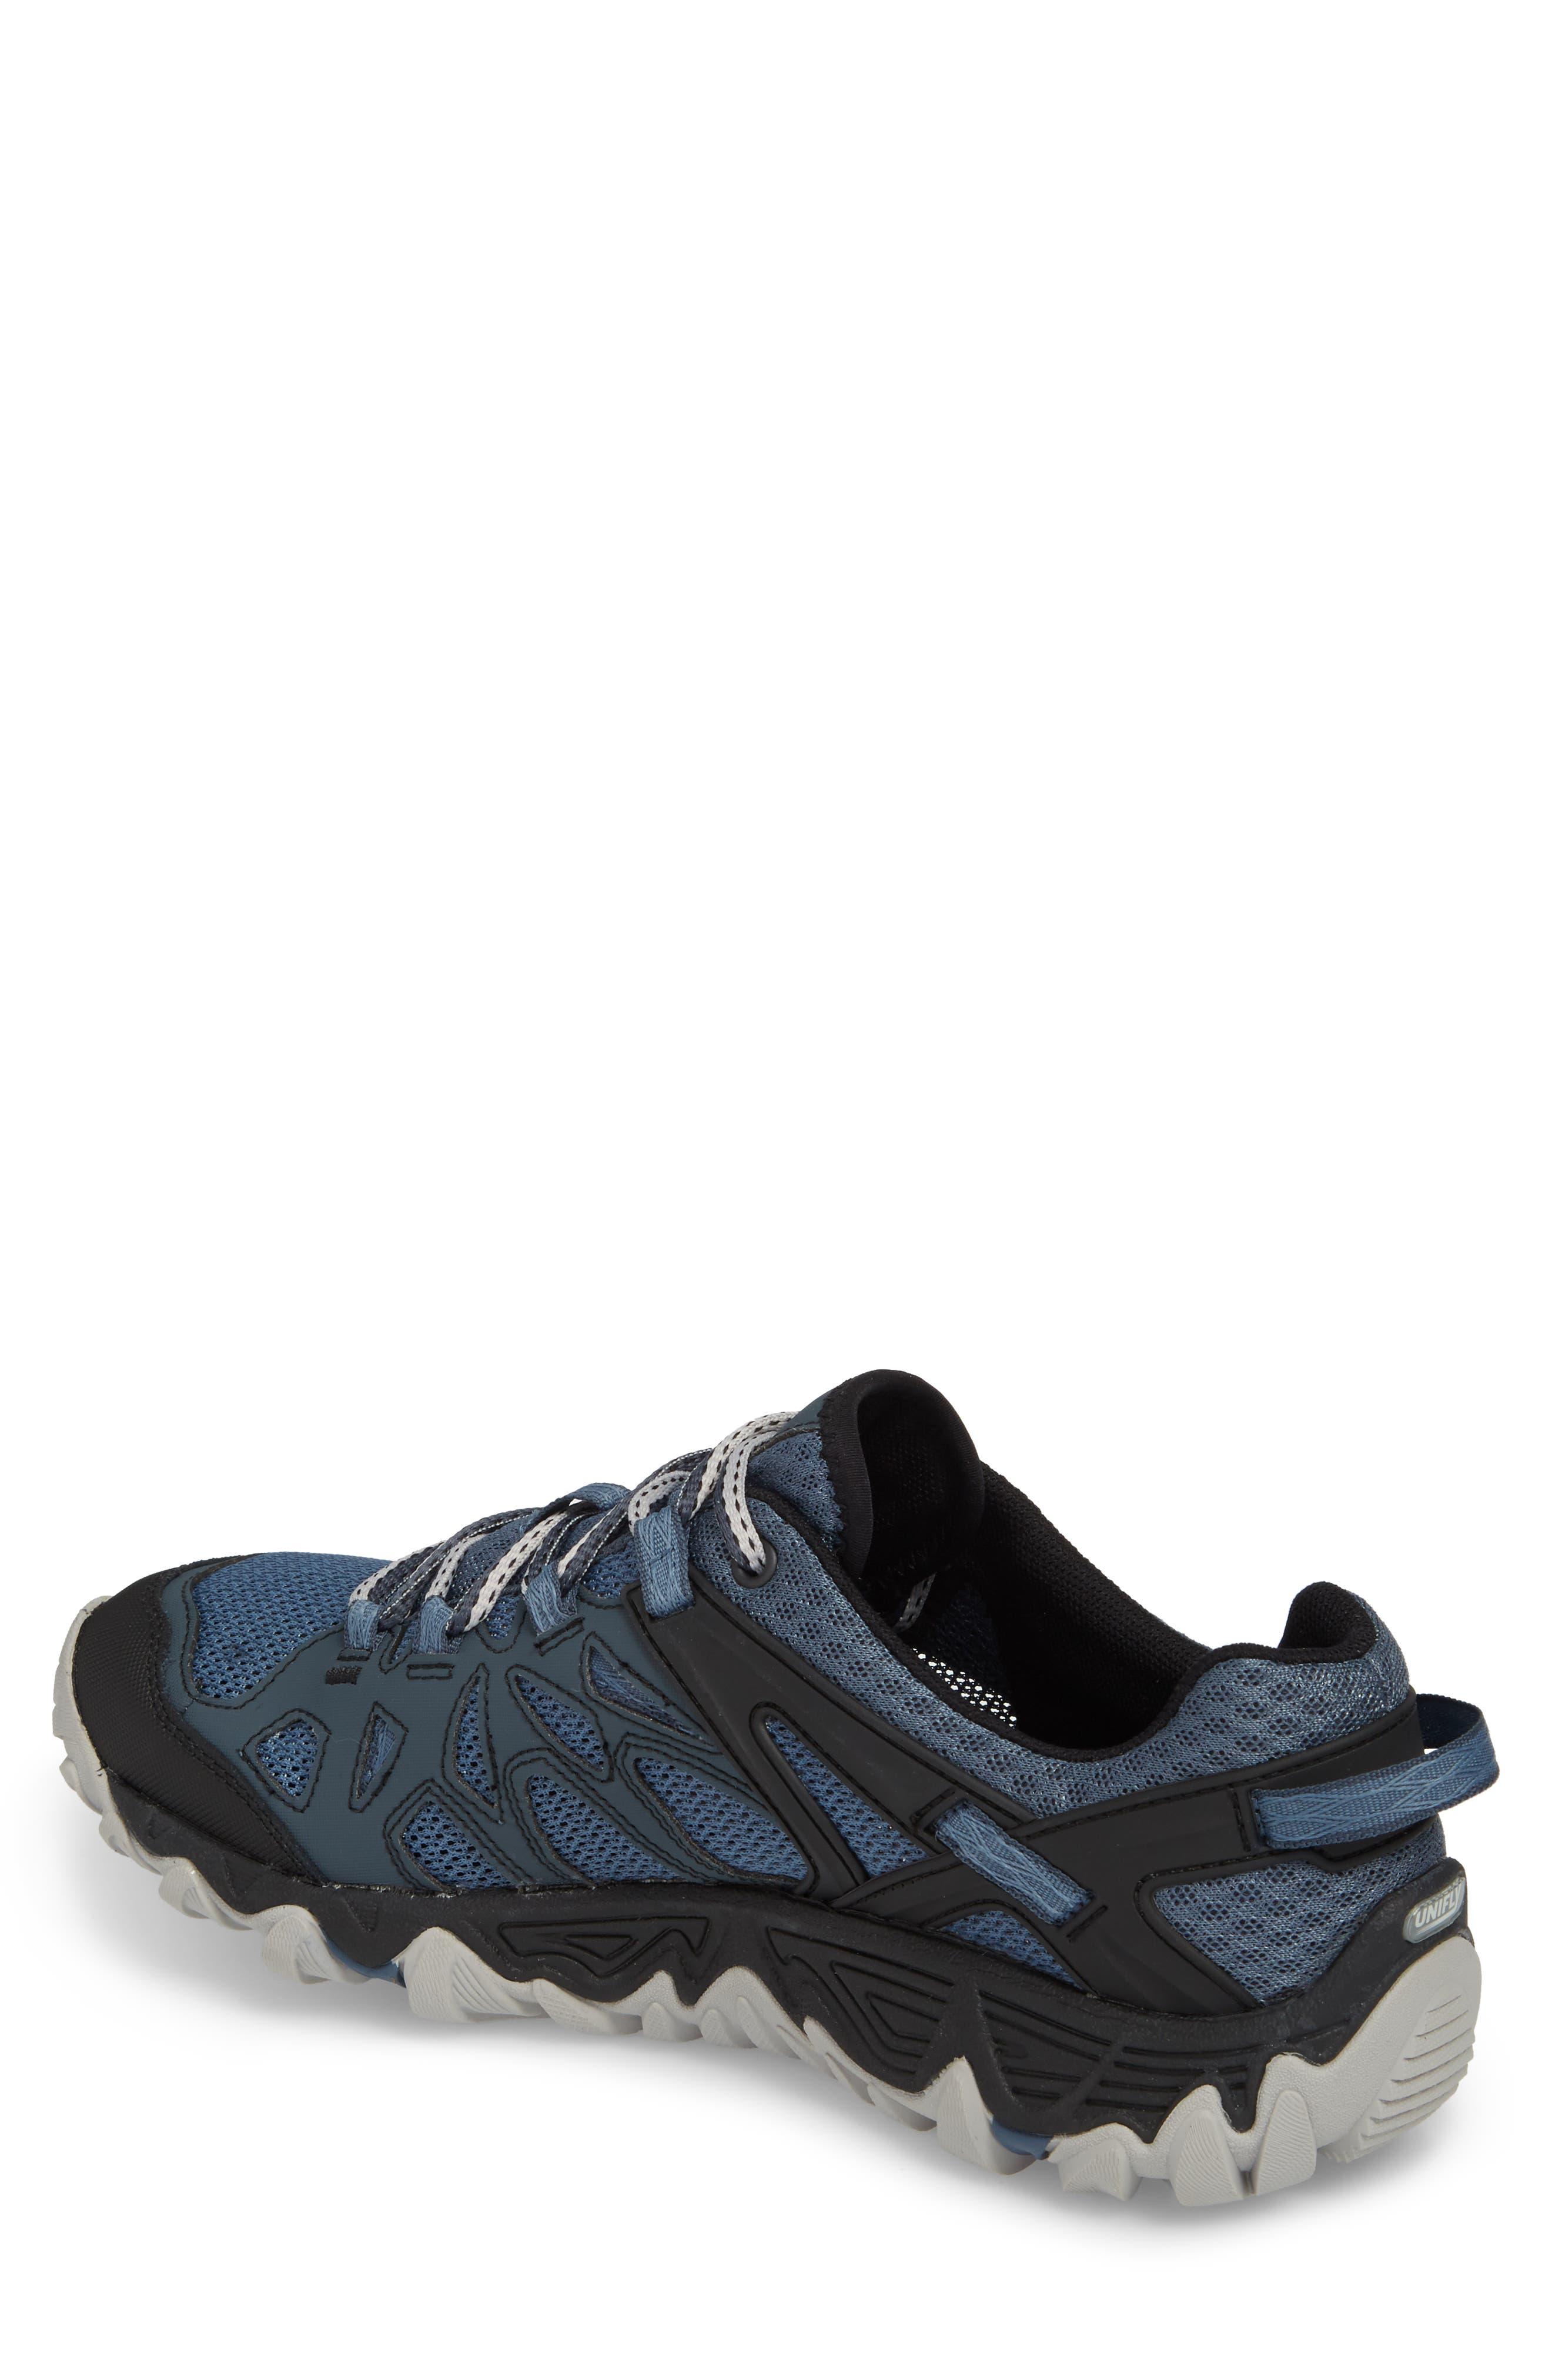 All Out Blaze Aero Sport Hiking Shoe,                             Alternate thumbnail 2, color,                             Slate